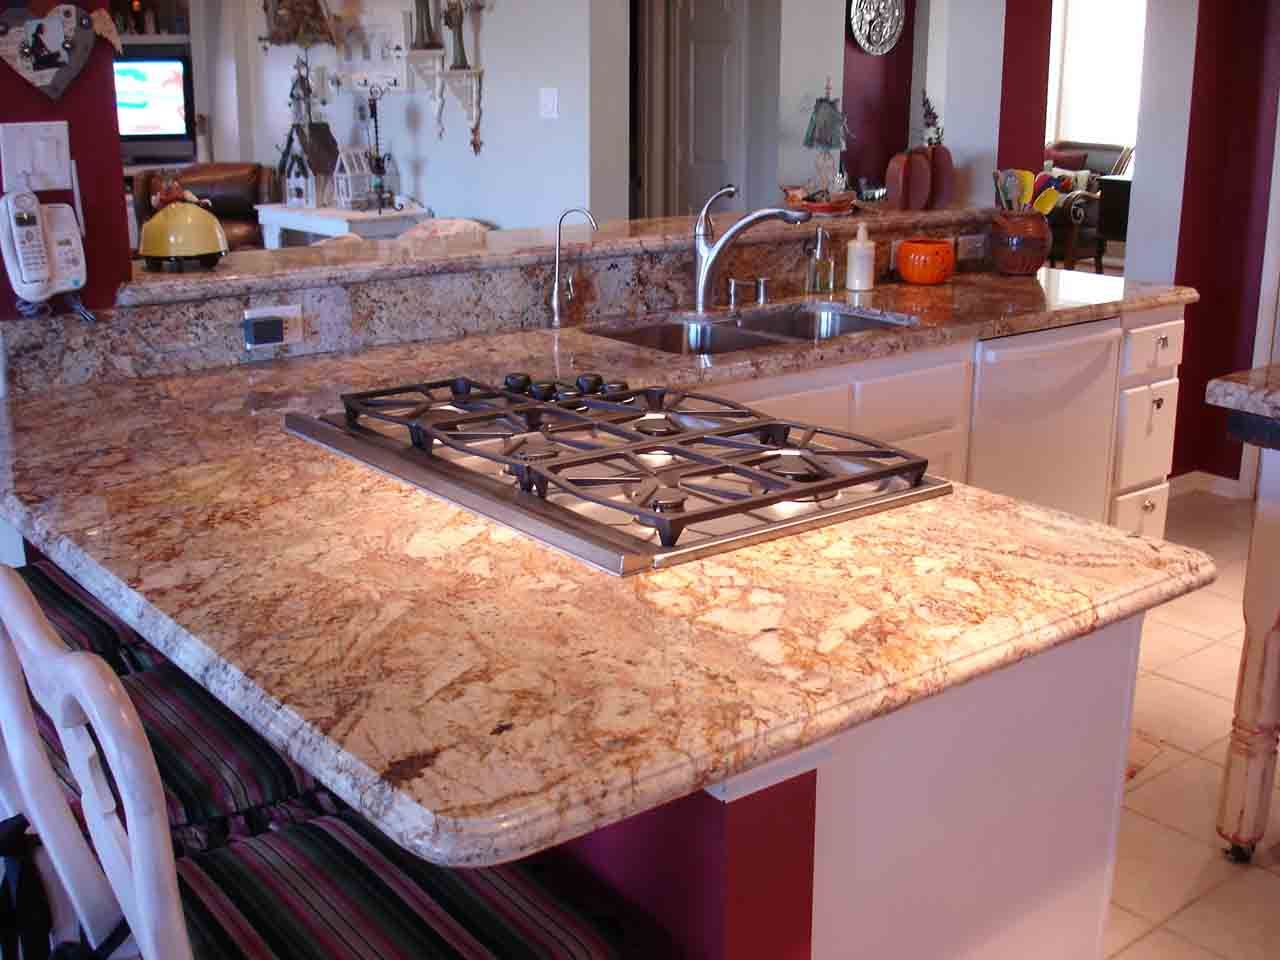 Typhoon Bordeaux Granite | Kitchen Ideas | Granite ... on Typhoon Bordeaux Granite Backsplash Ideas  id=84293